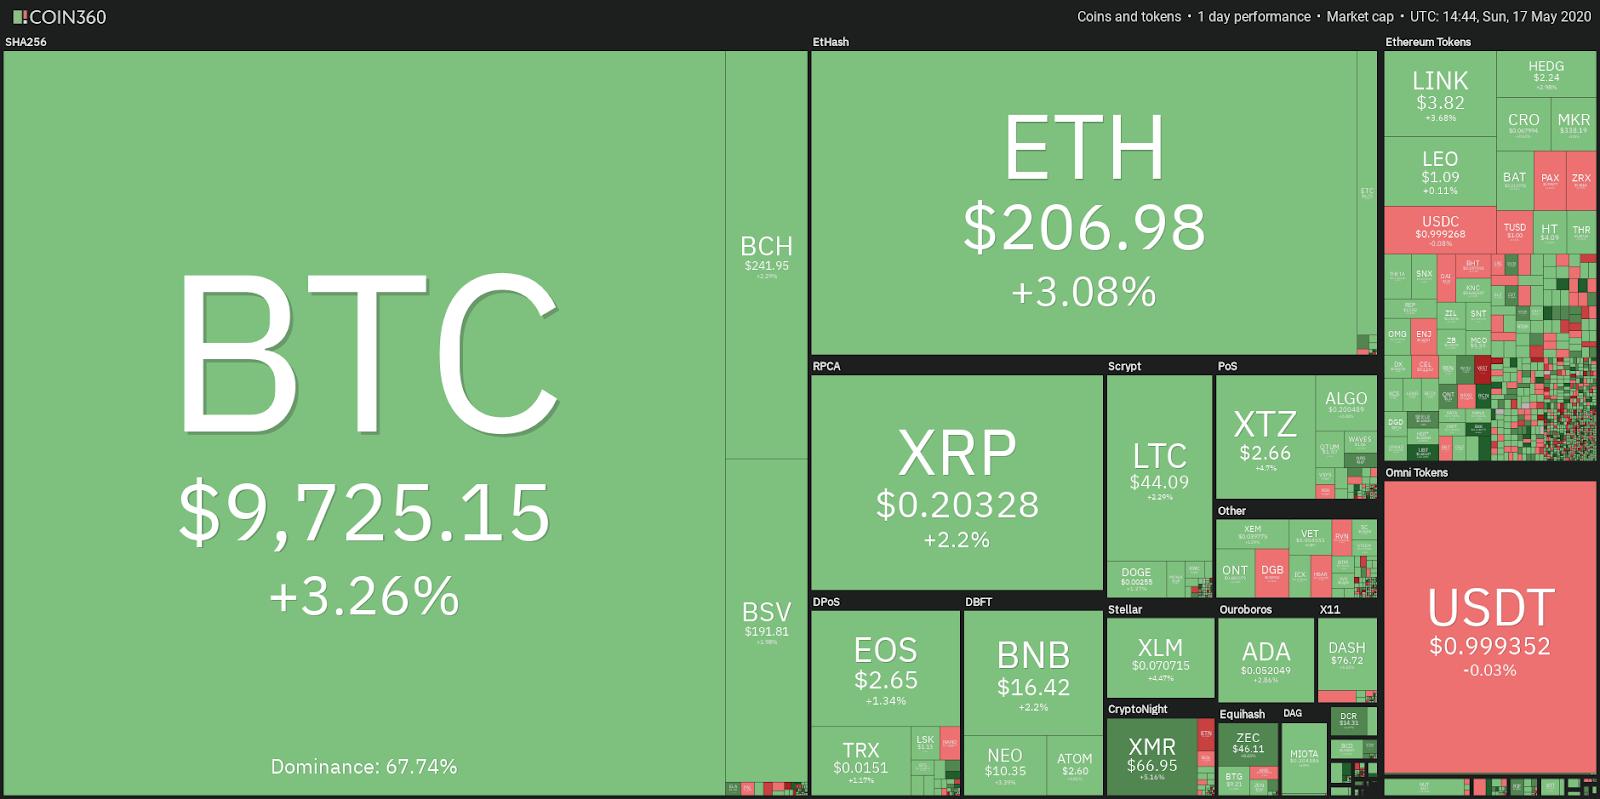 Top 5 Cryptocurrencies to Watch This Week: ETH, XLM, ADA, XMR, CRO